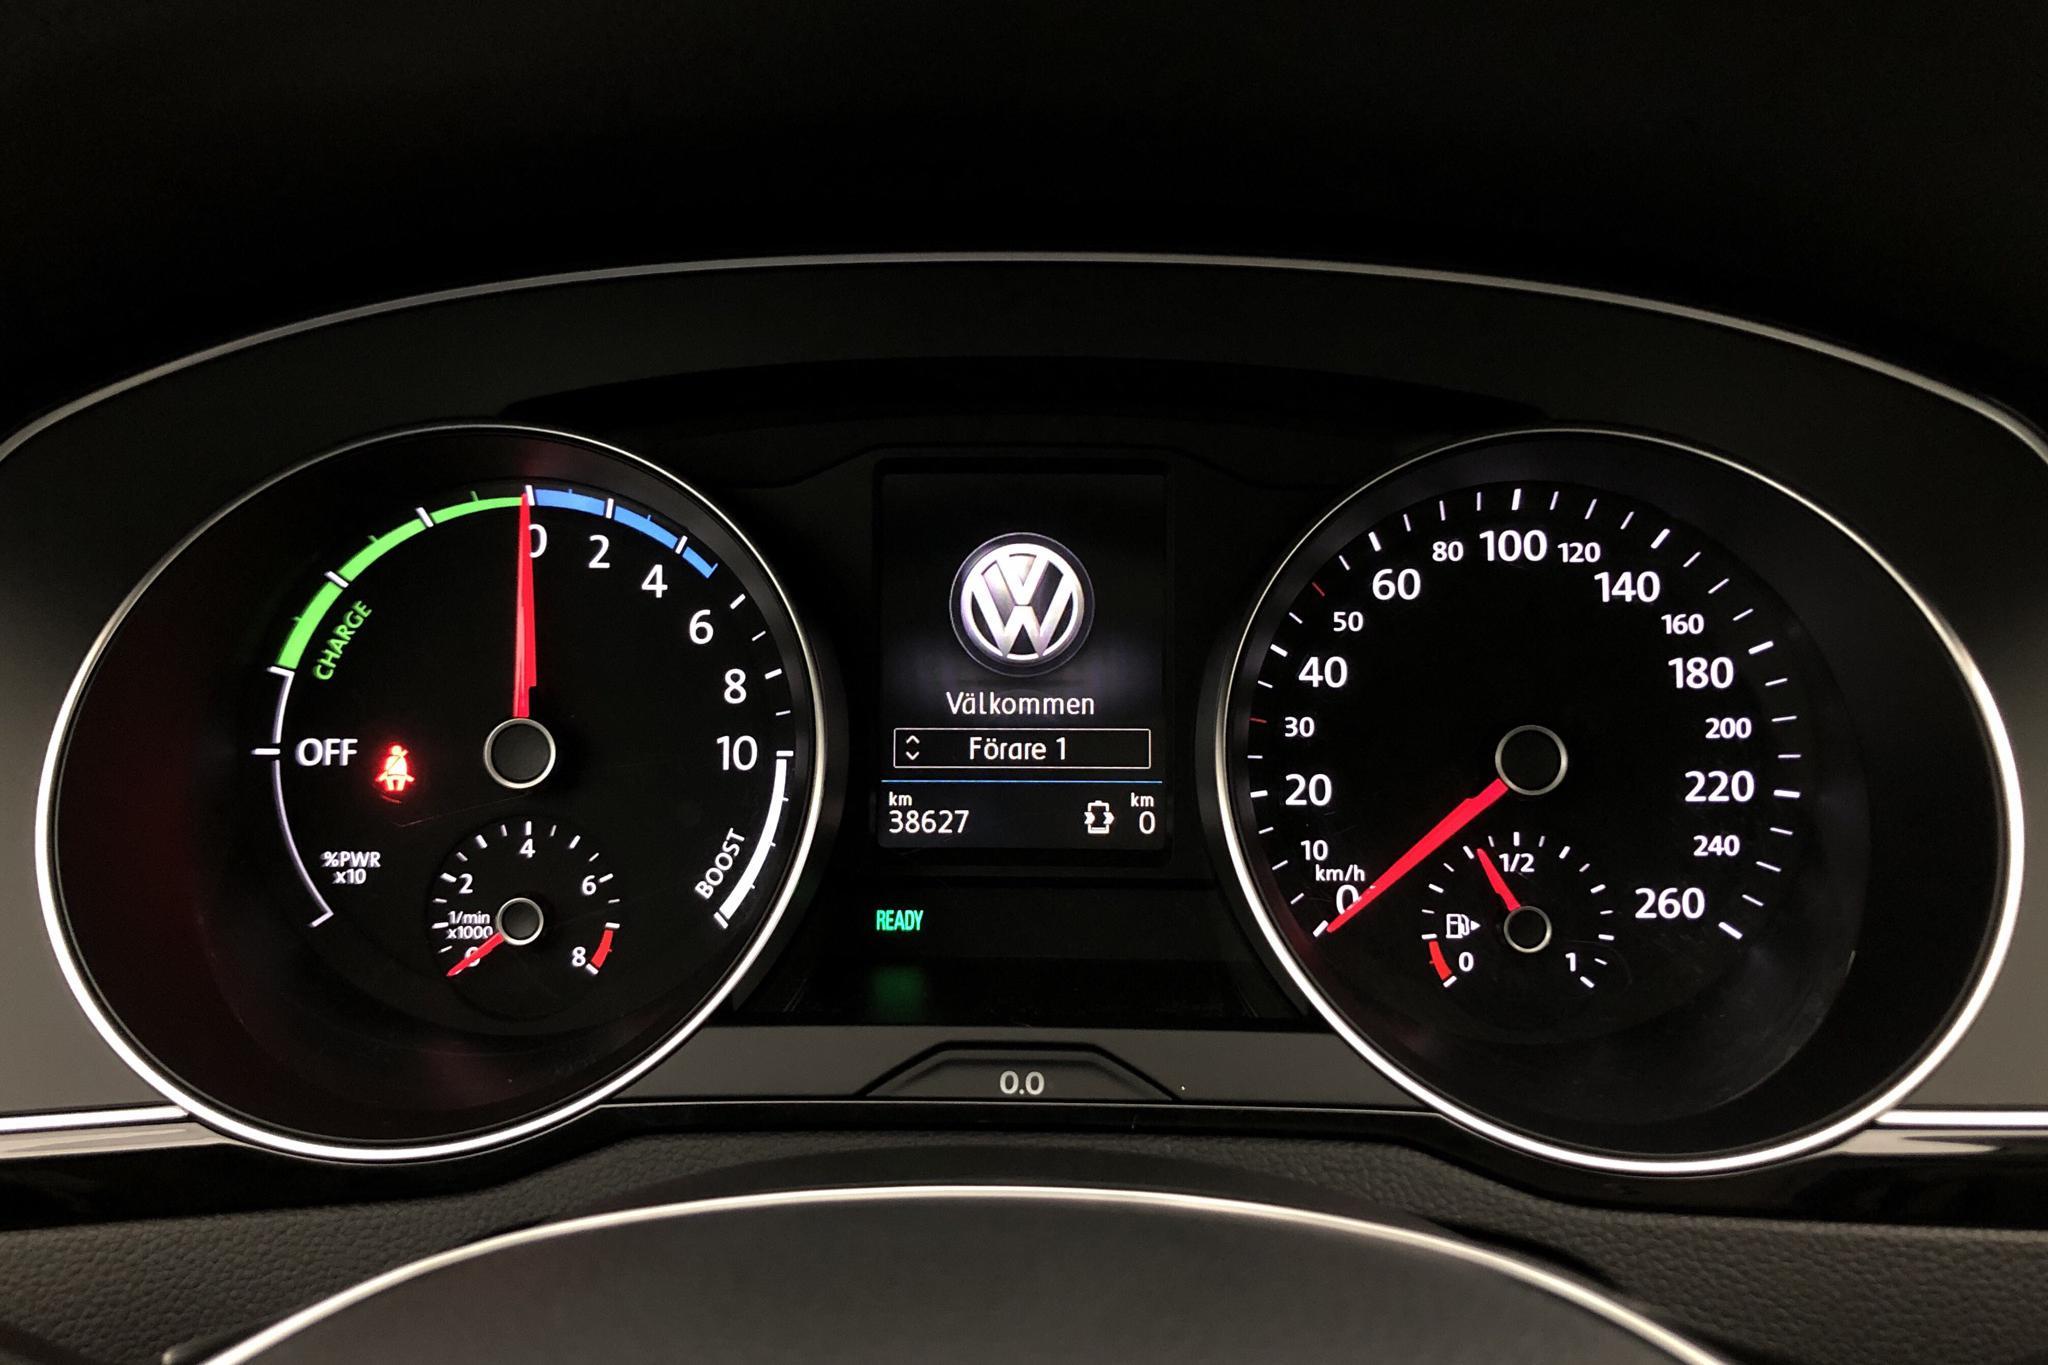 VW Passat 1.4 Plug-in-Hybrid Sportscombi (218hk) - 38 620 km - Automatic - white - 2017